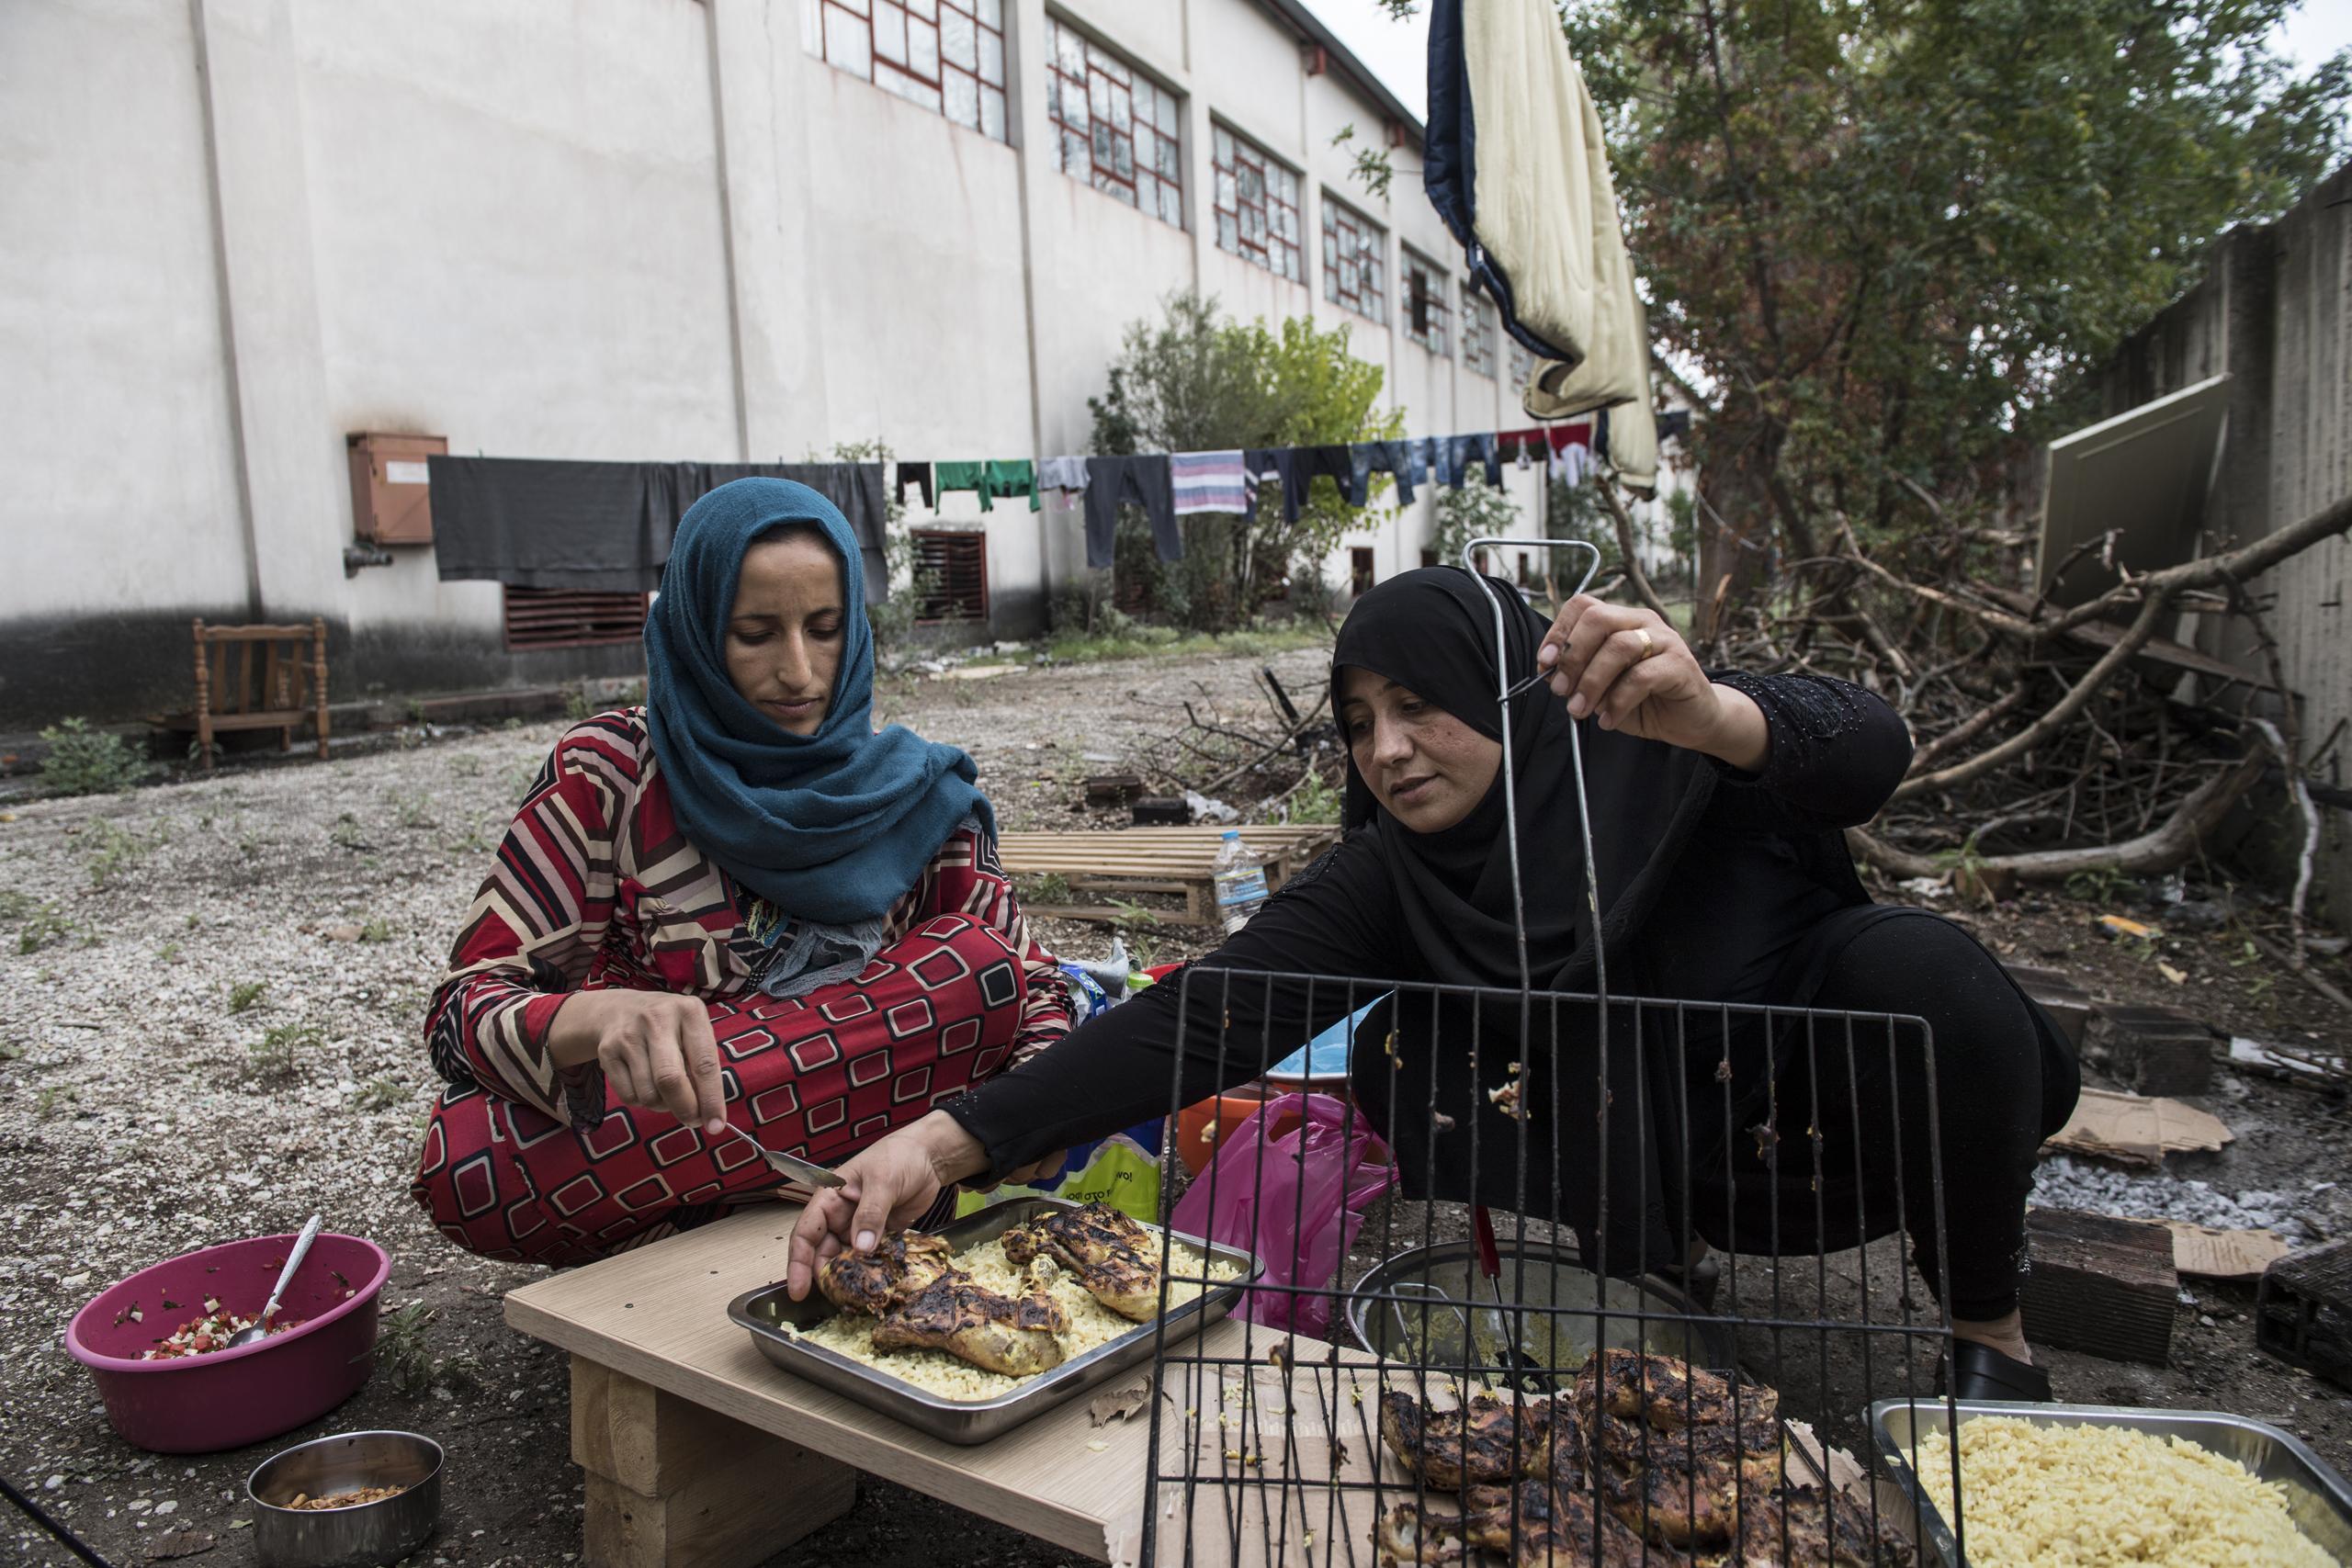 Illham Alarabi cooks outside the Oreokastro camp, Sept. 9, 2016,